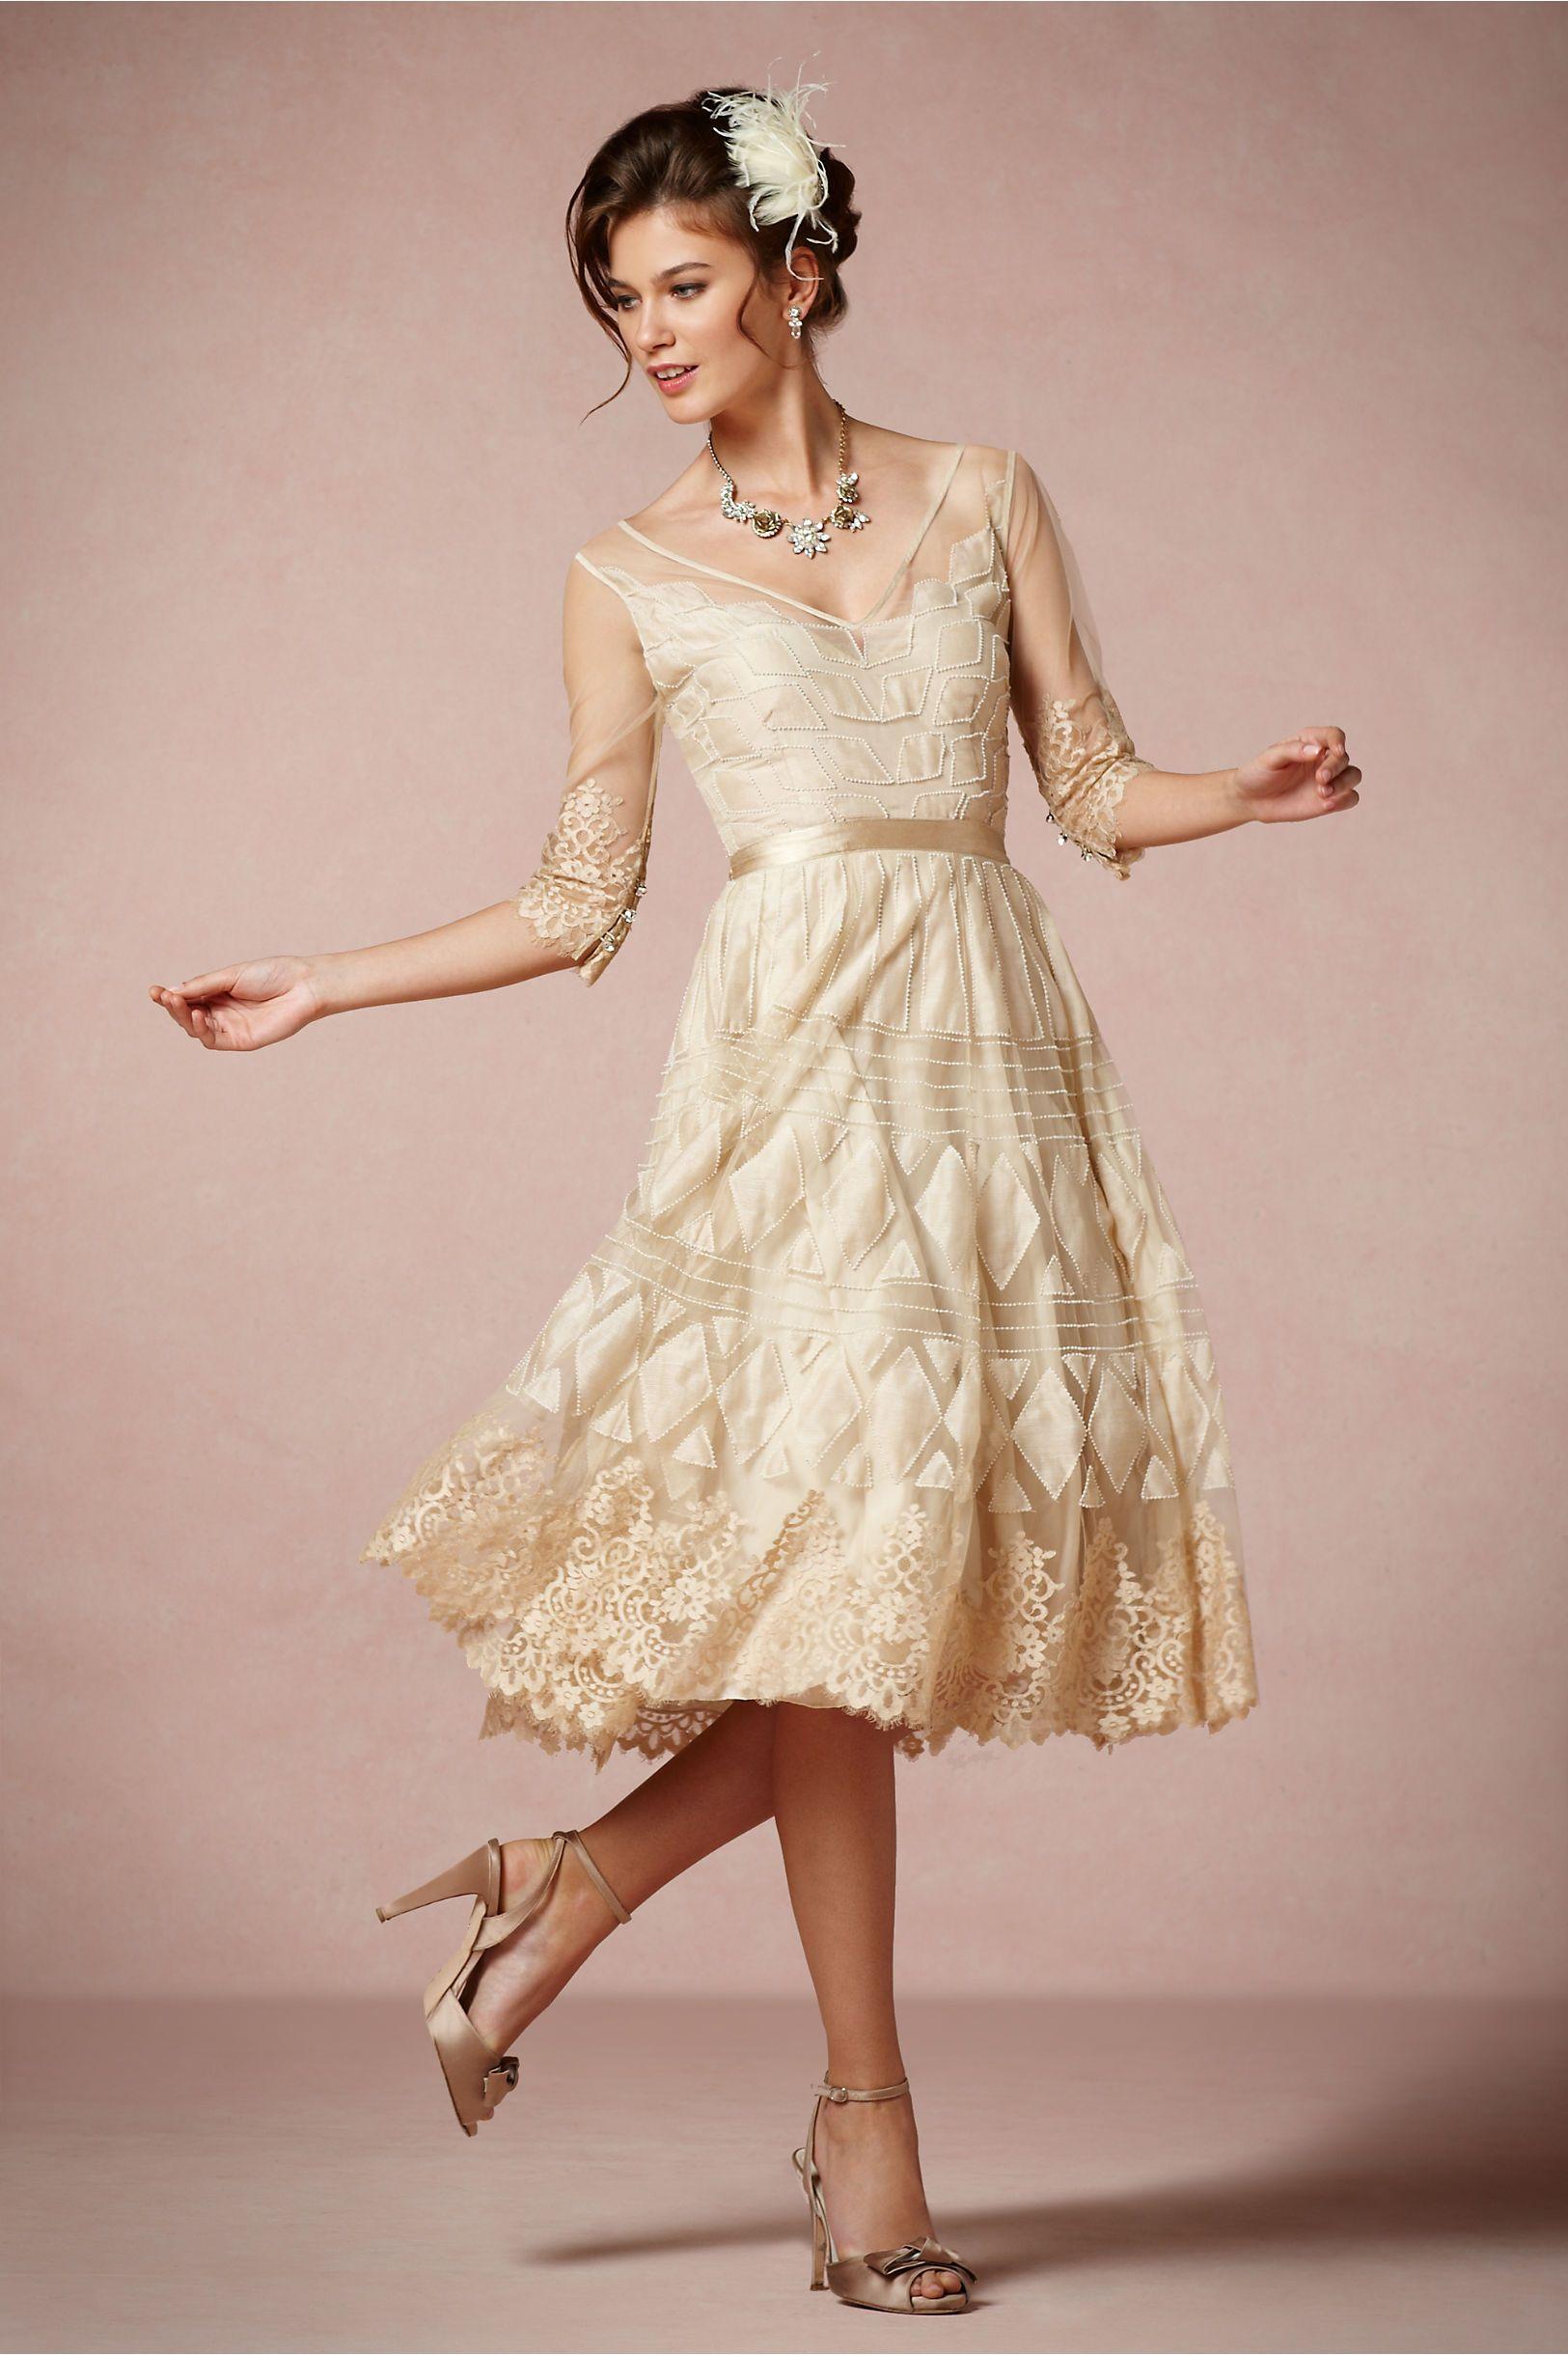 Charm School Dress from BHLDN | Vintage Romance | Pinterest ...